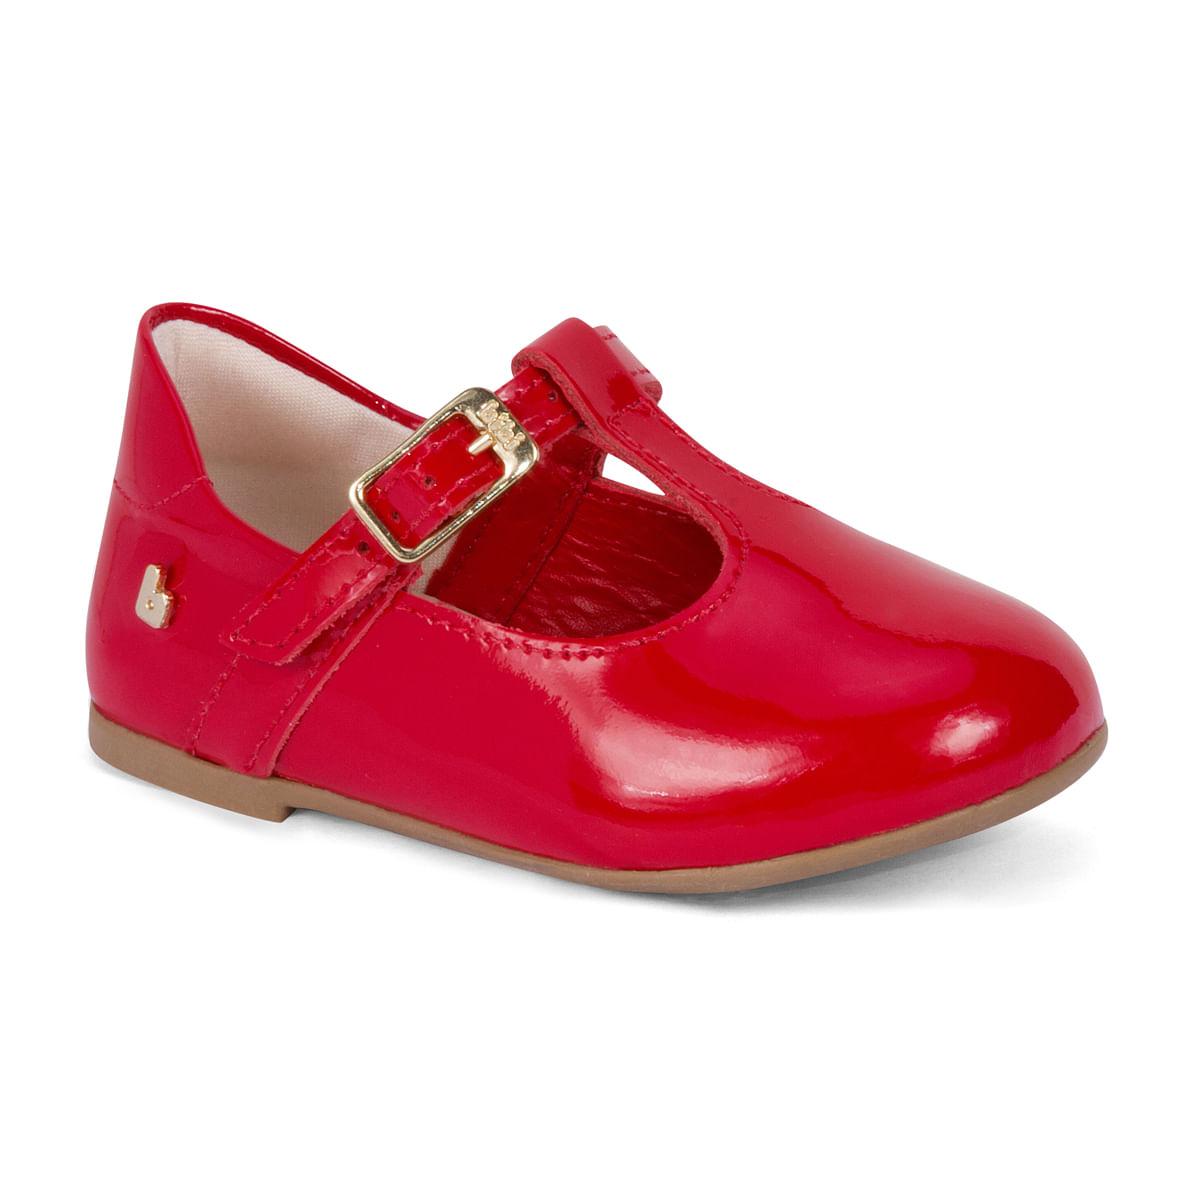 053784614a Sapatilha Infantil Feminina Bibi Vermelha Anjos Joy 1072039 - Bibi ...